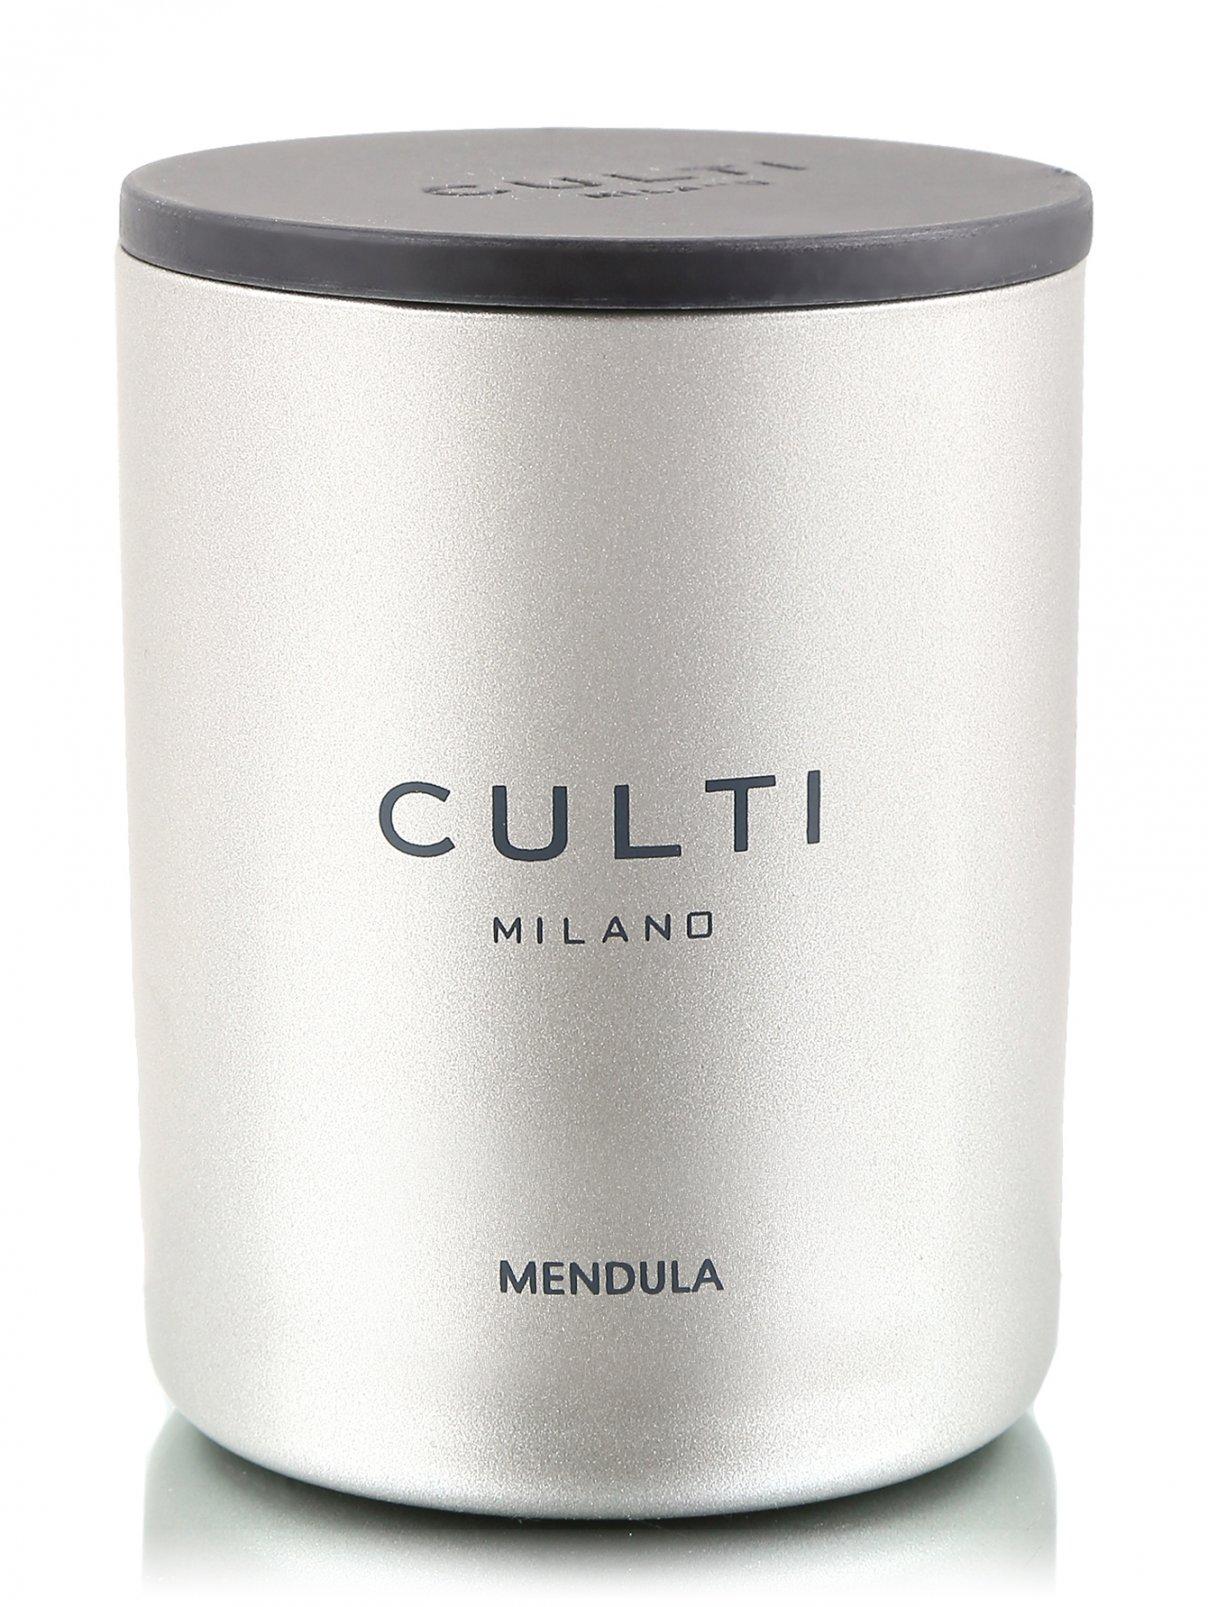 Ароматическая свеча Mendula 250 г Home Fragrance Culti Milano  –  Общий вид